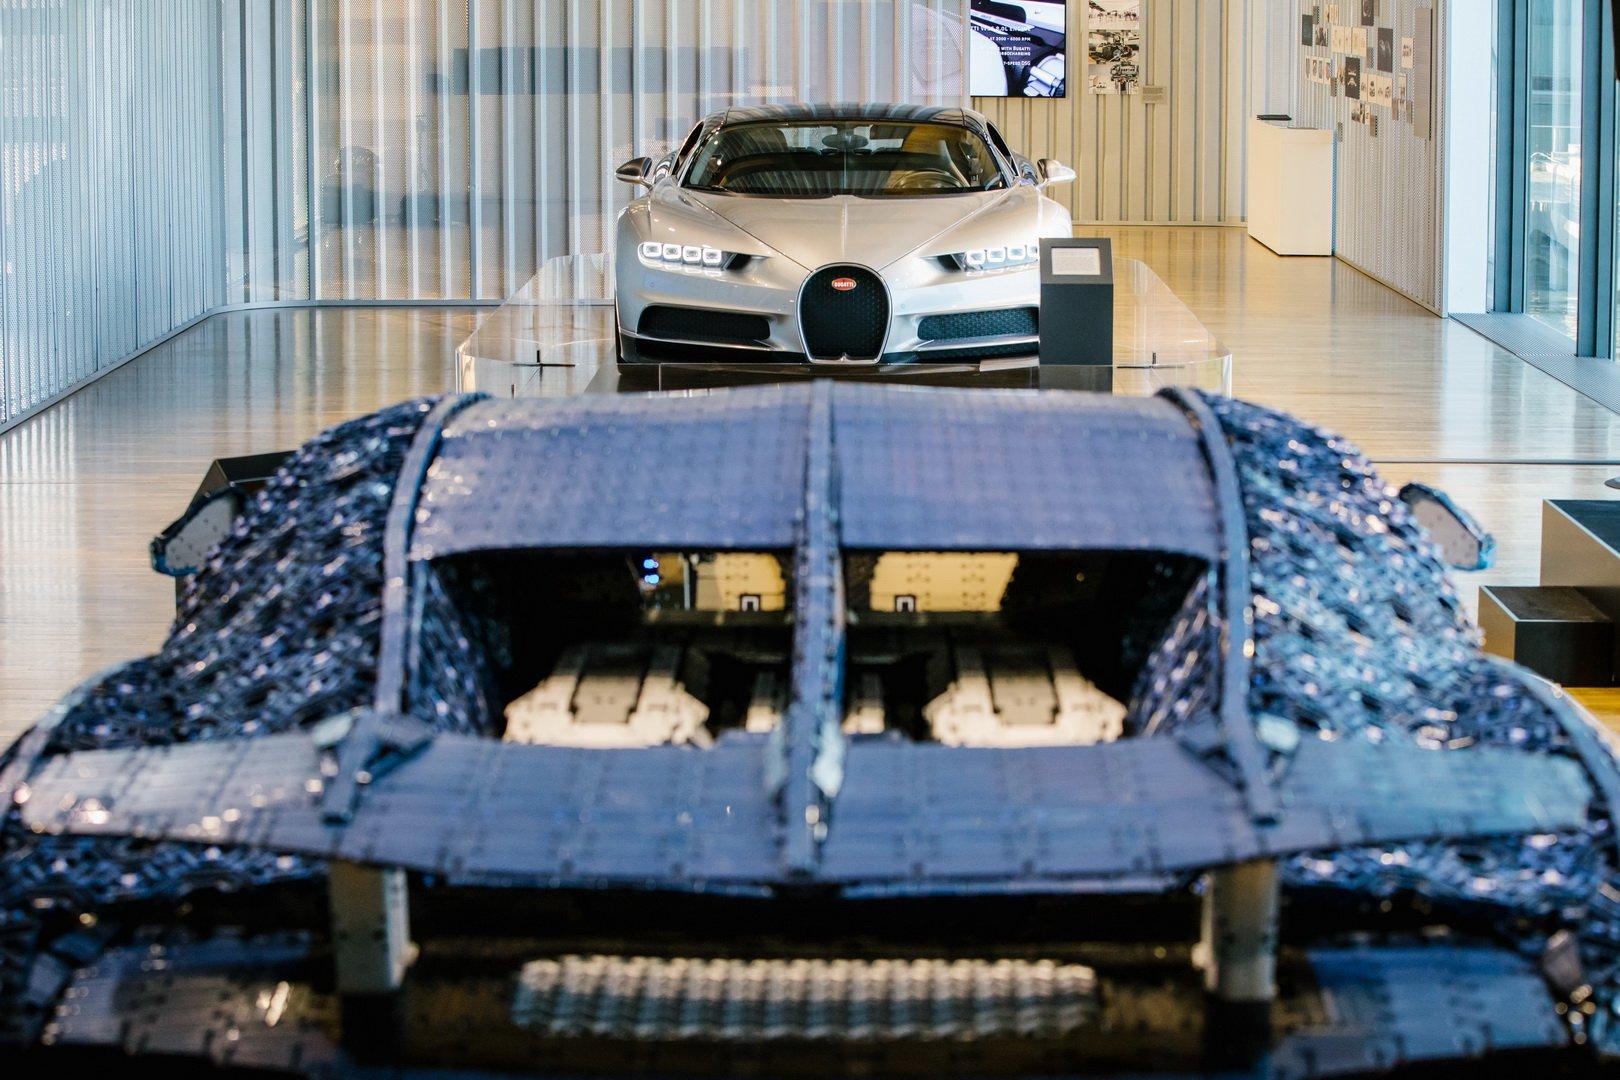 Bugatti Chiron Lego at VW Zeithaus Museum (3)